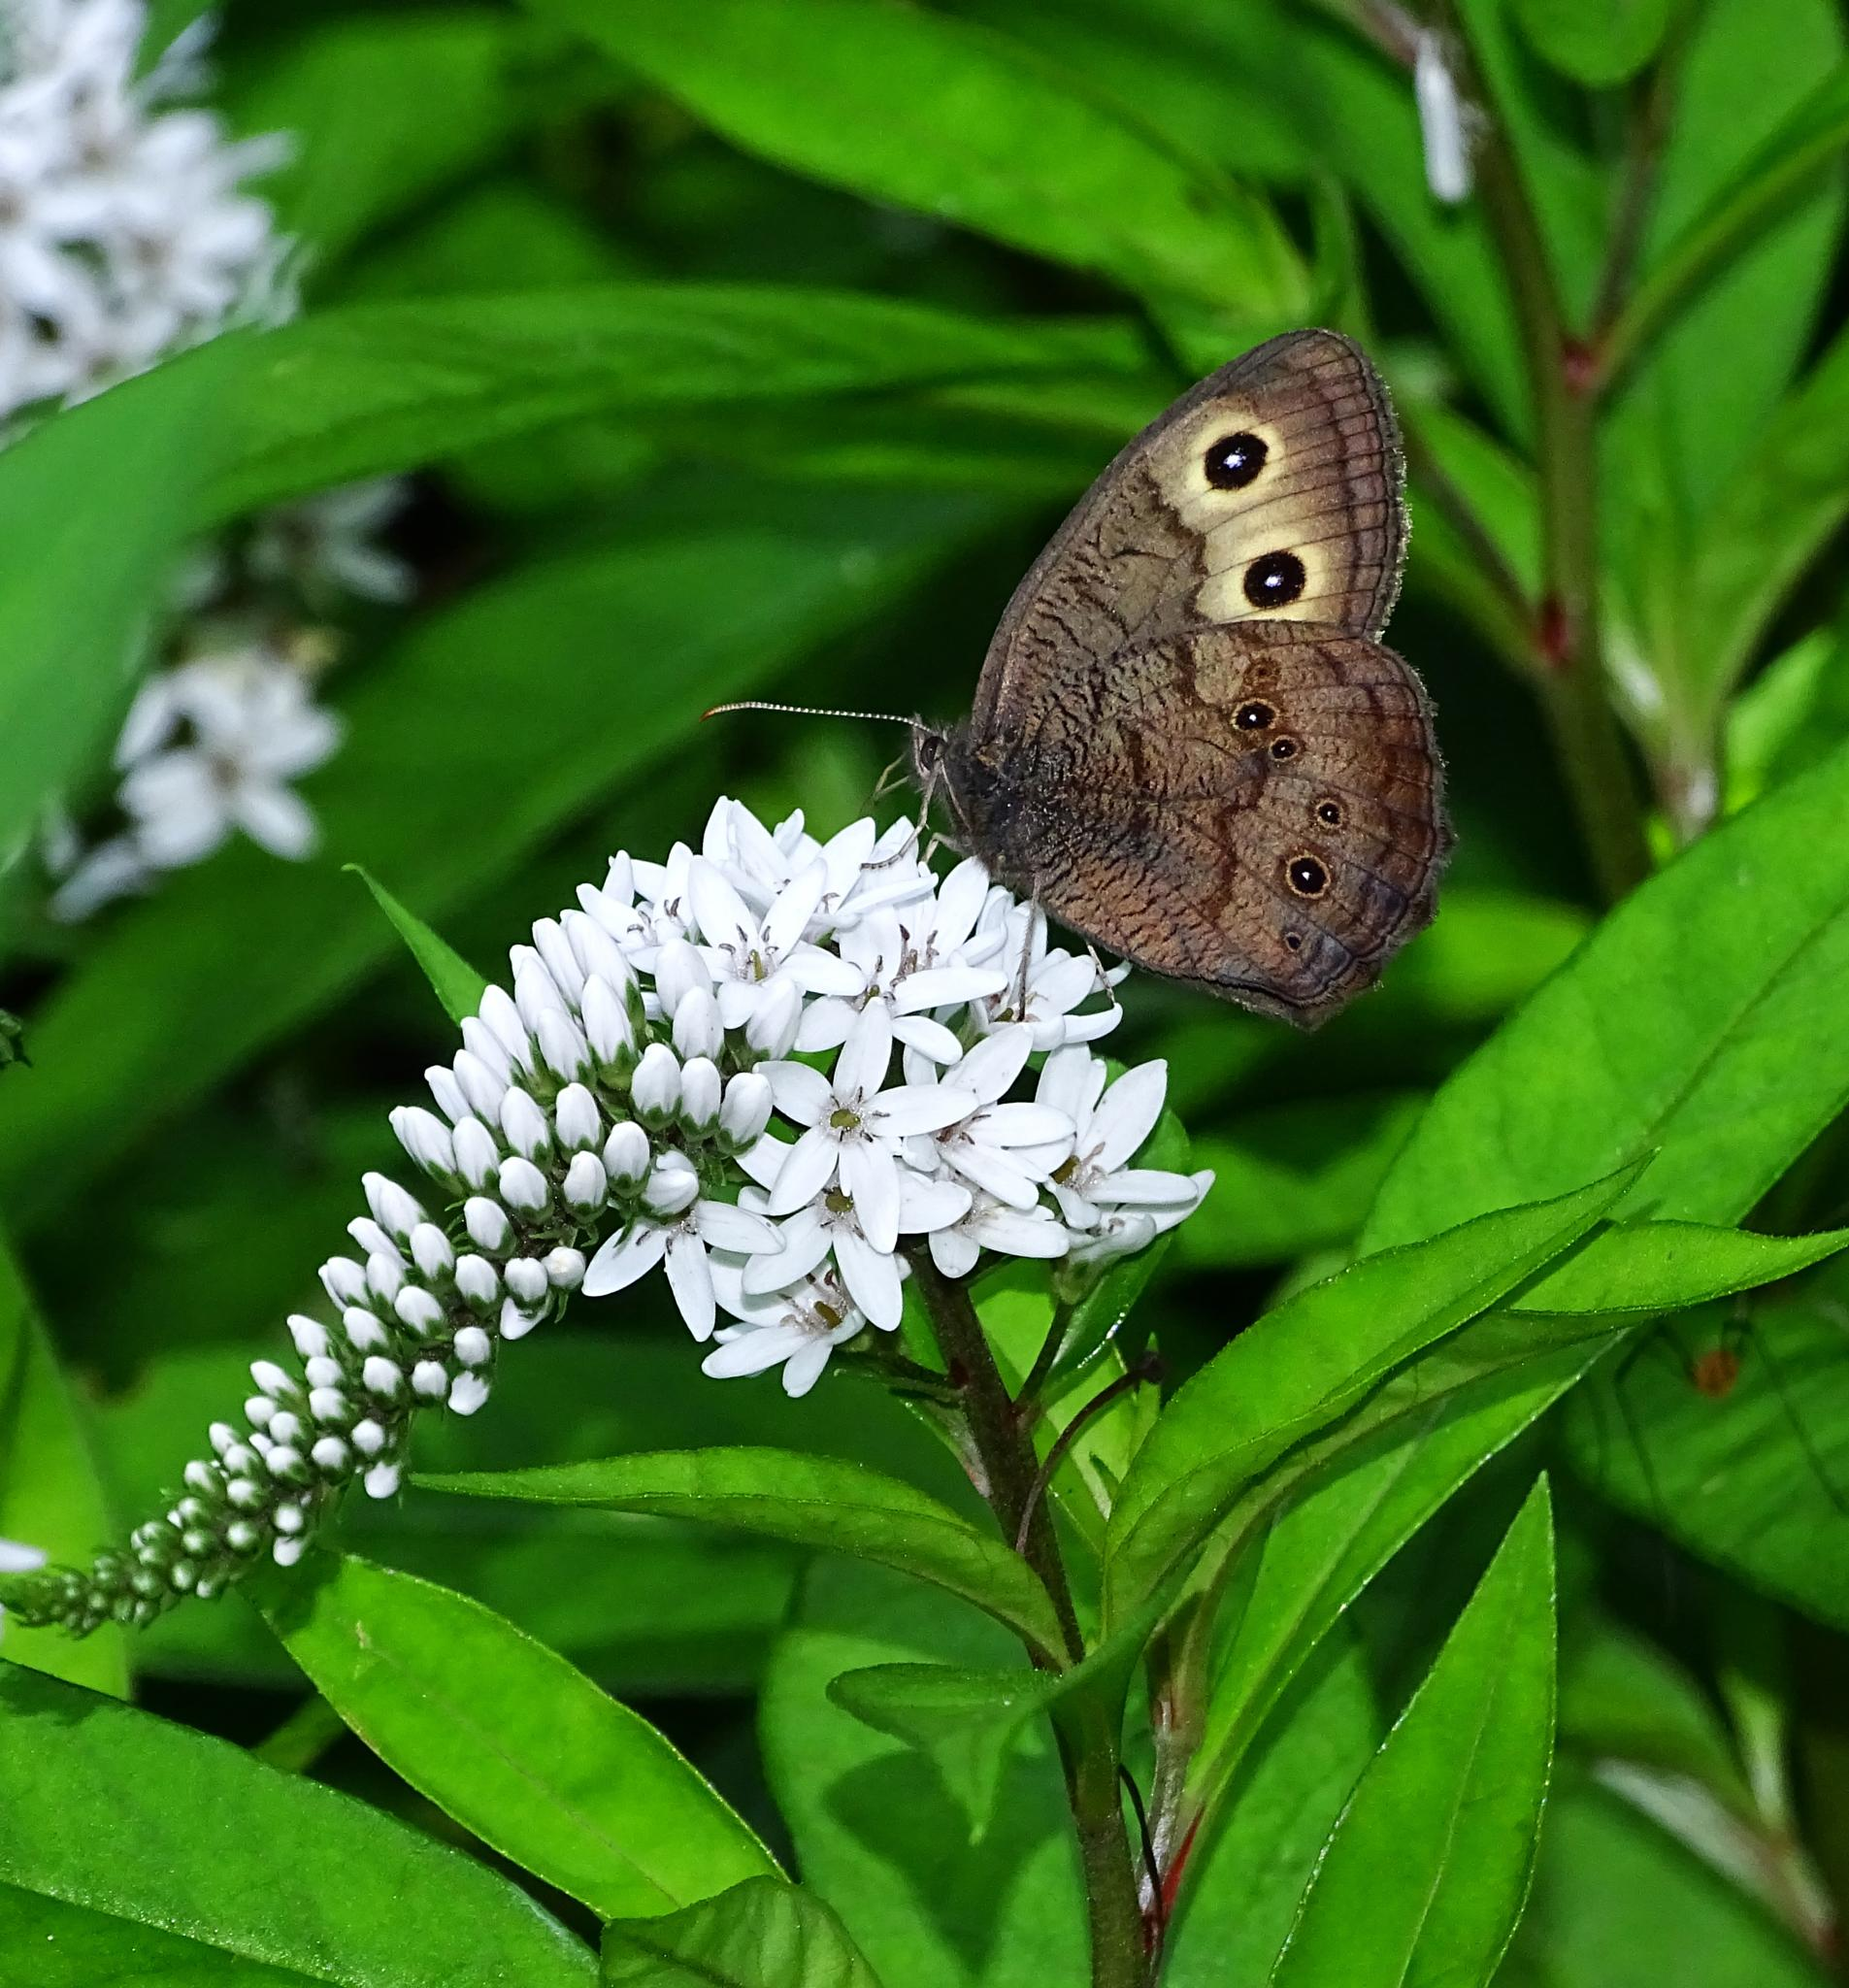 Butterfly on Gooseneck Loosestrife by paulette.king